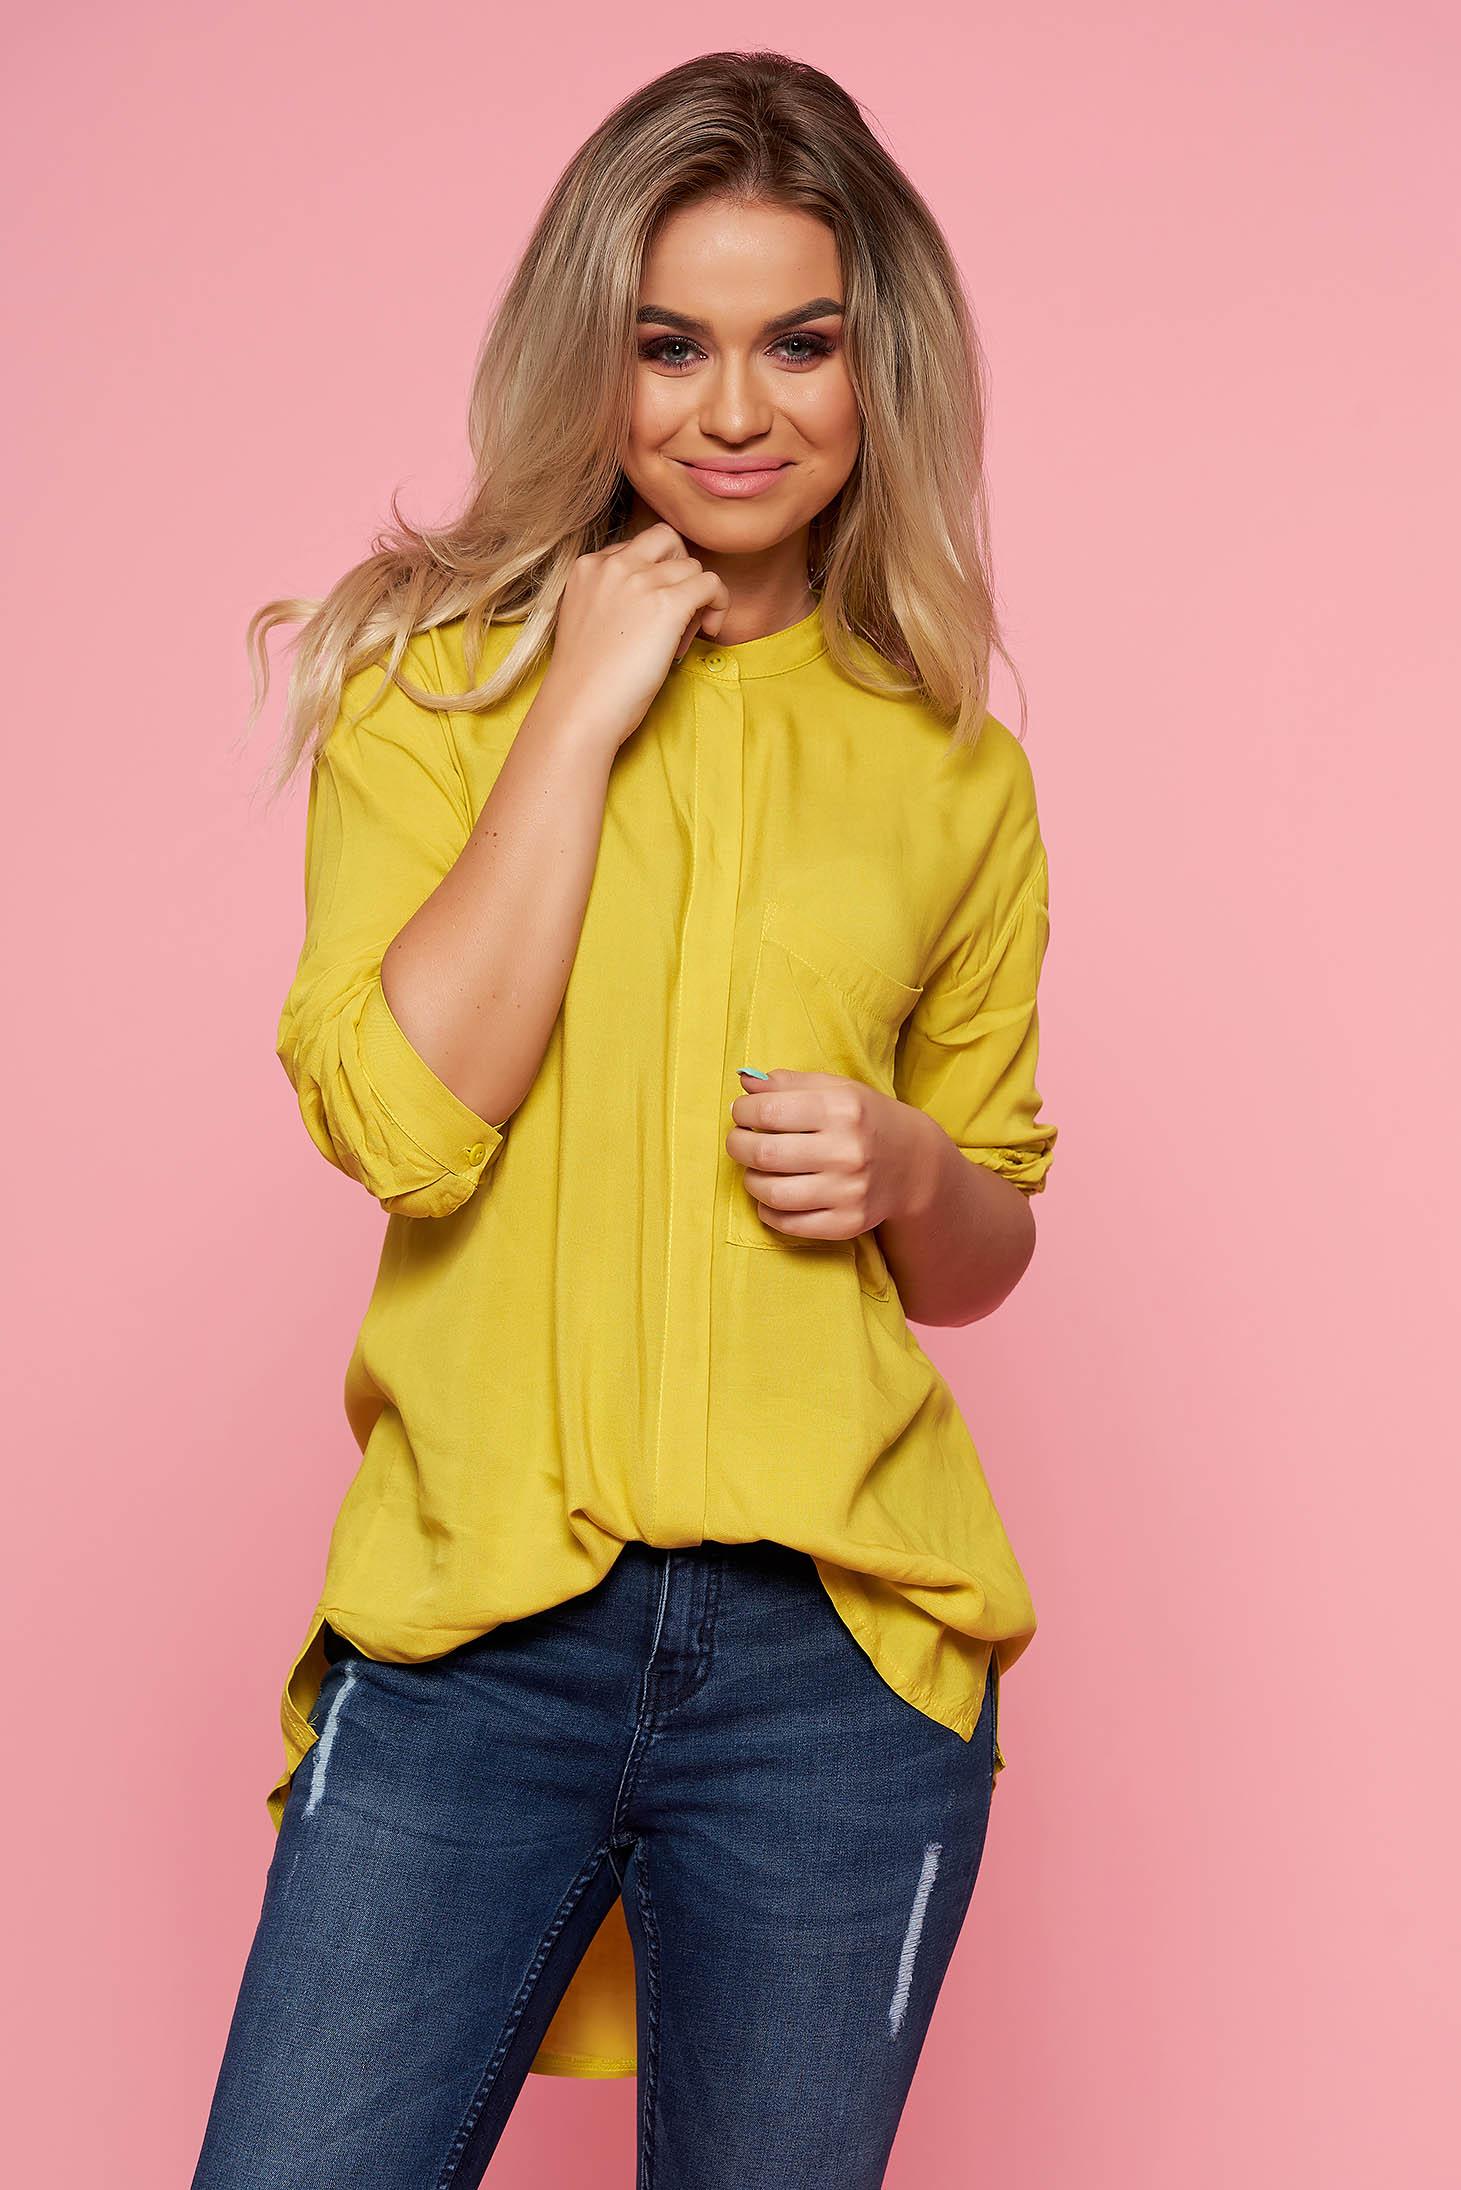 Top Secret yellow casual asymmetrical flared women`s shirt airy fabric long sleeved